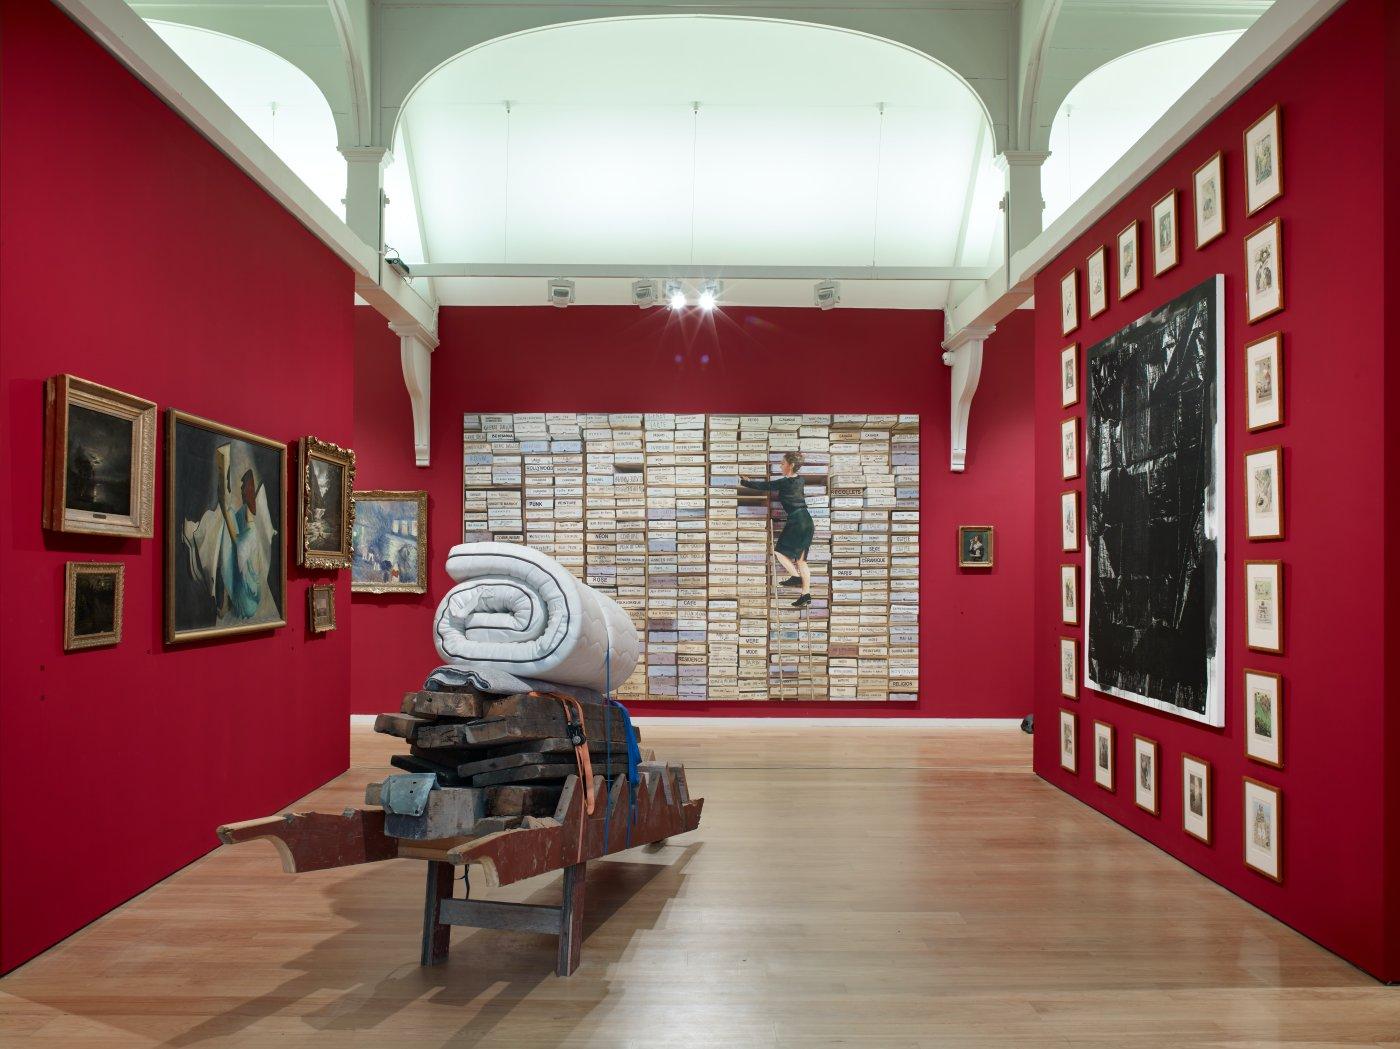 Whitechapel Gallery Christen Sveaas Art Collection 2